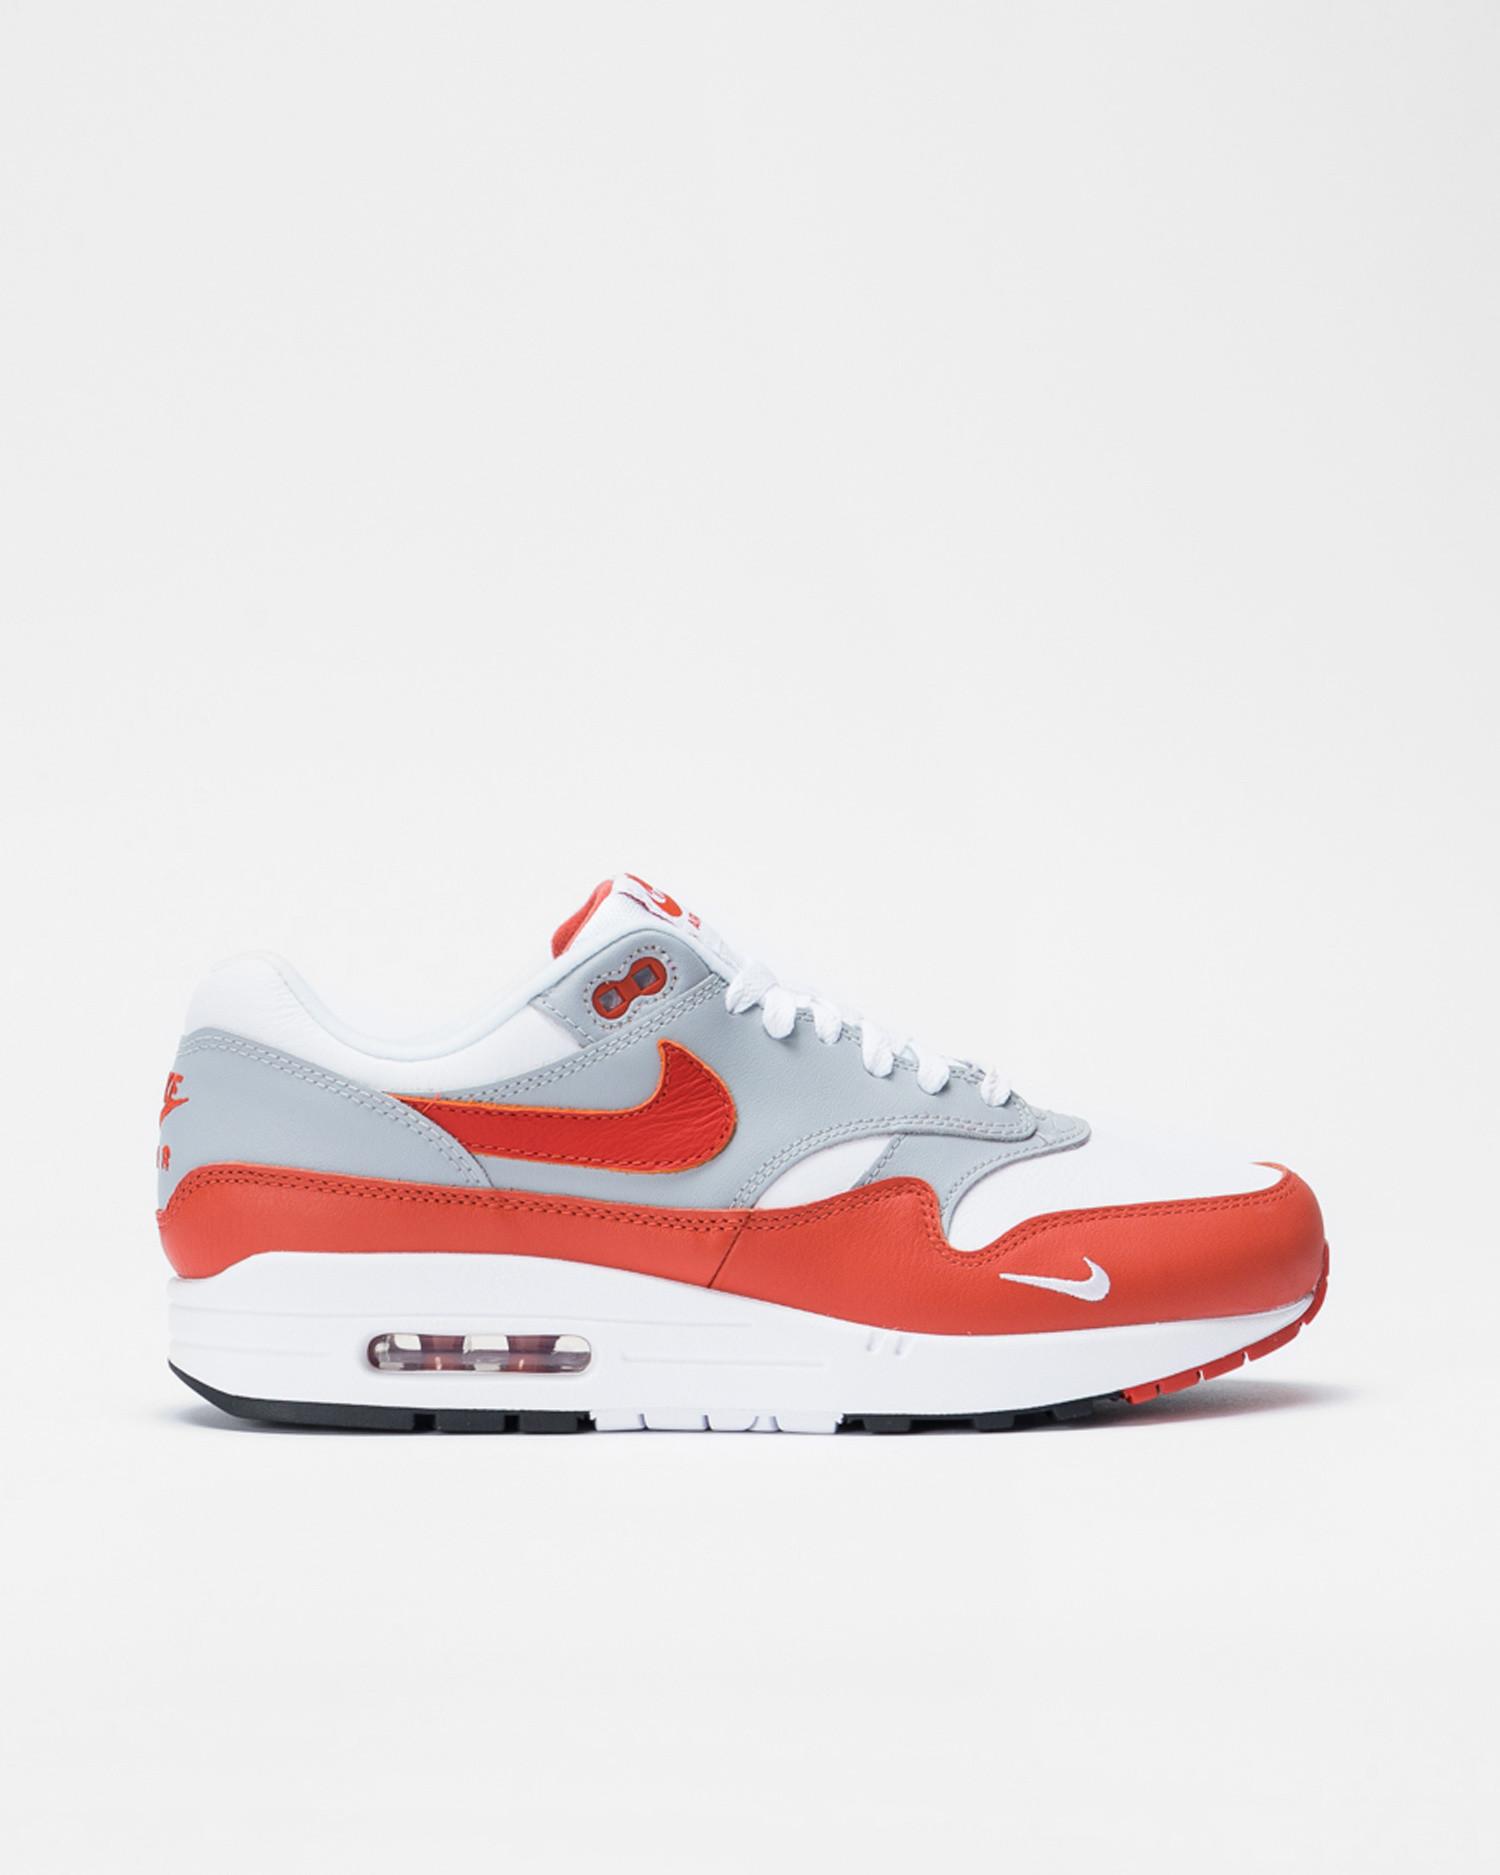 Nike air max 1 lv8 White/martian sunrise-wolf grey-black